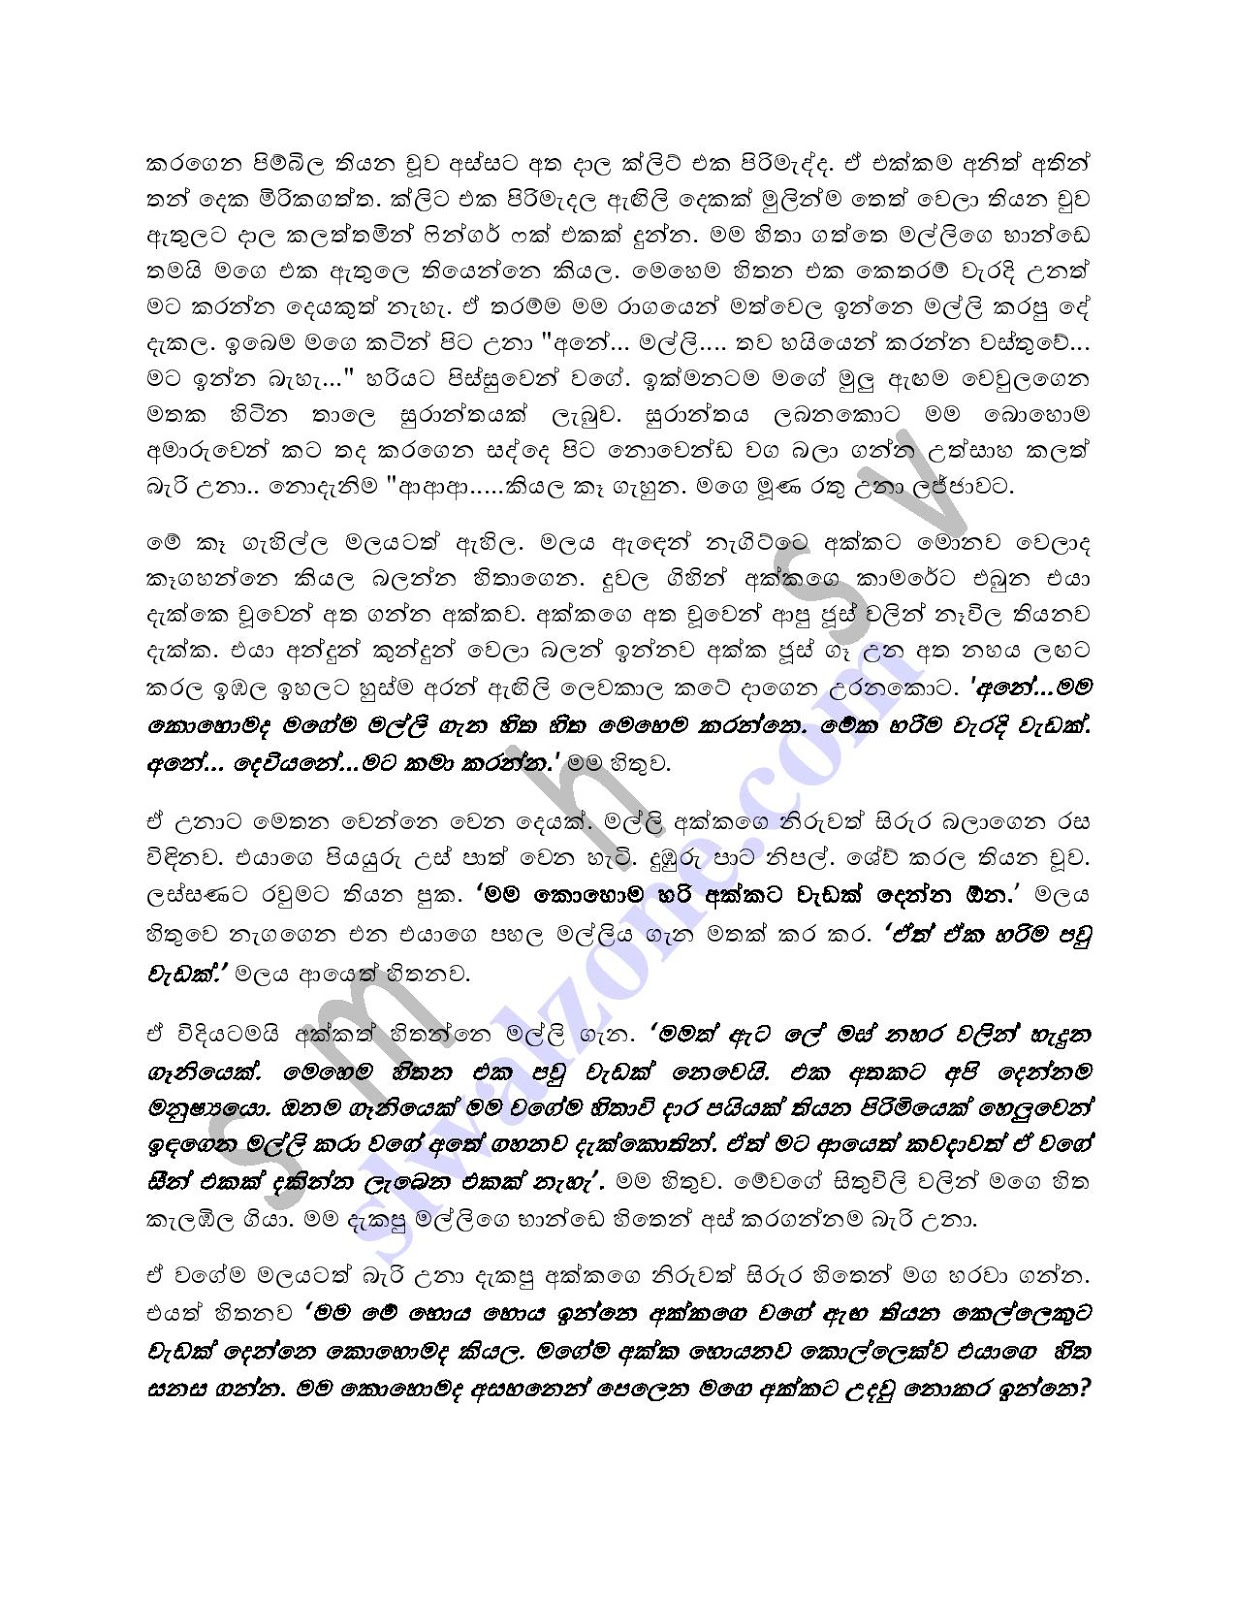 Akkage Aluth Mahaththaya - Sinhala Wal Katha